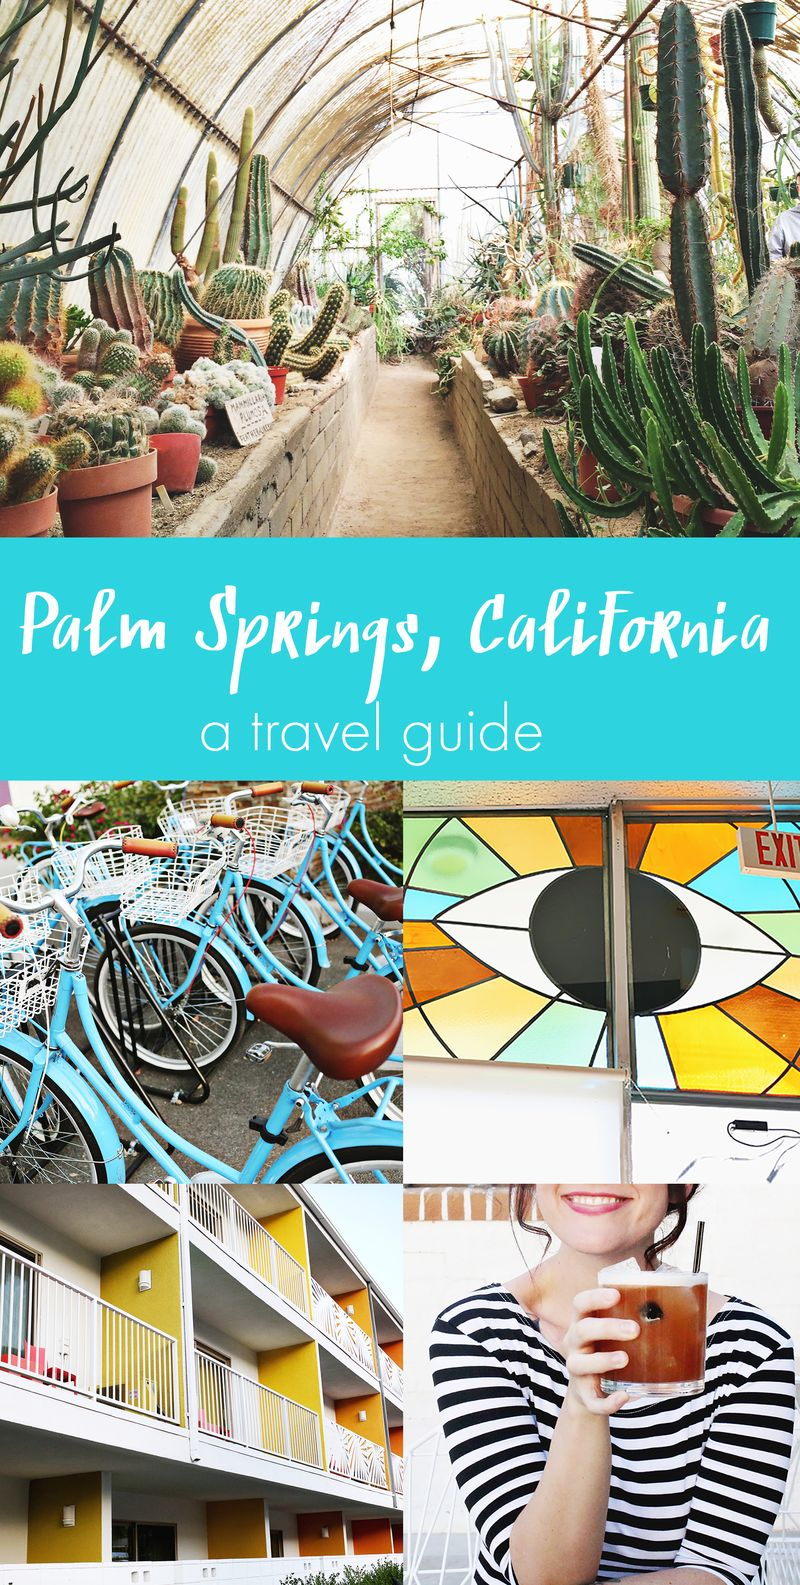 Palm Springs, California Travel Guide